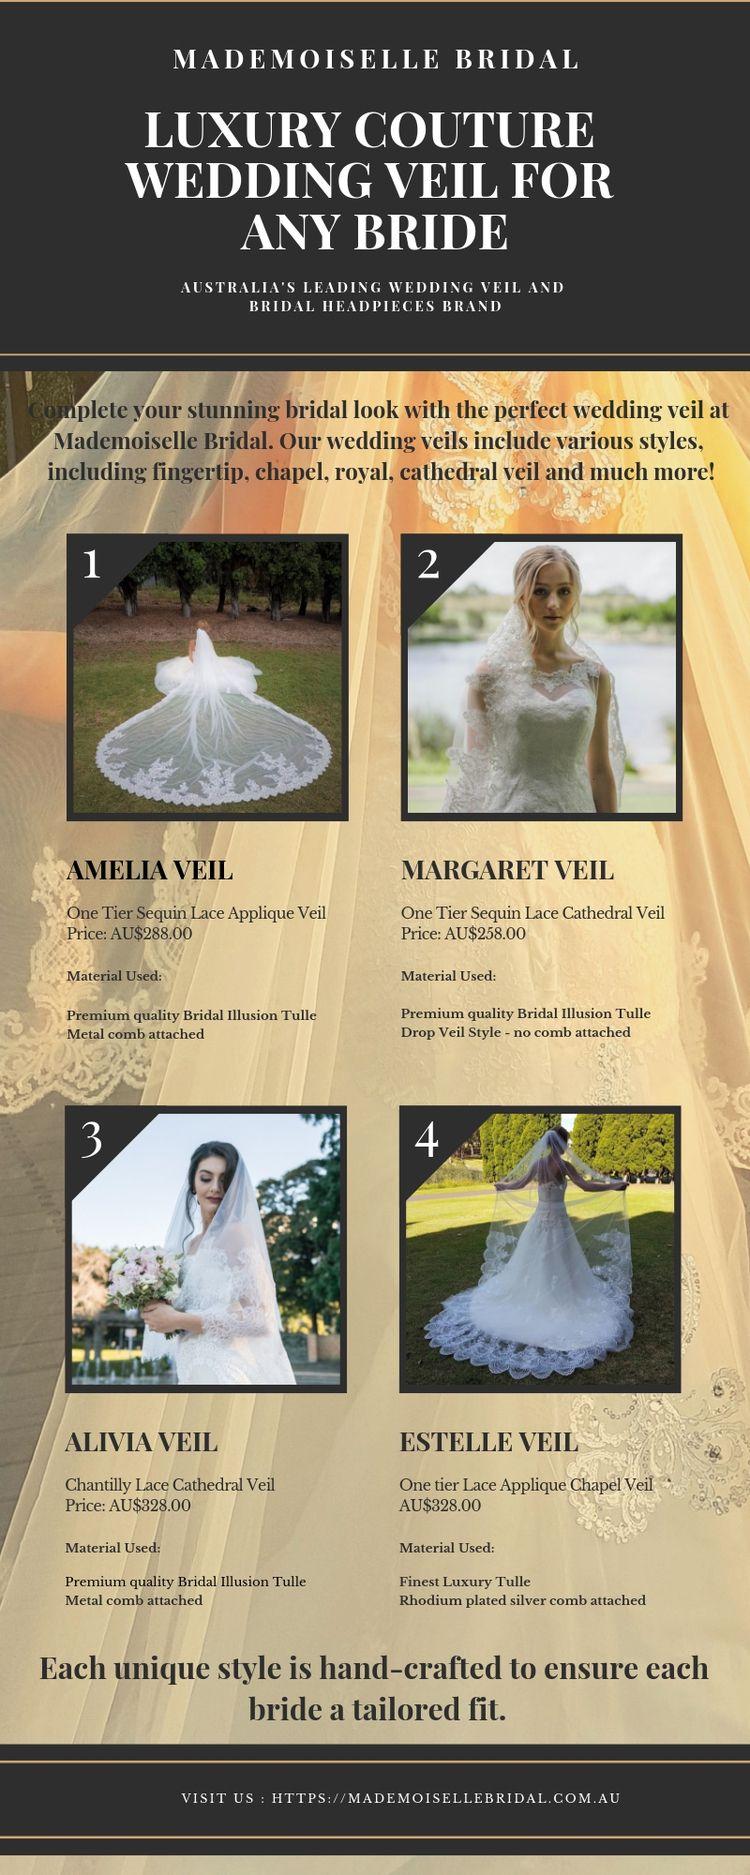 Luxury Couture Wedding Veil  - mademoisellebridal   ello